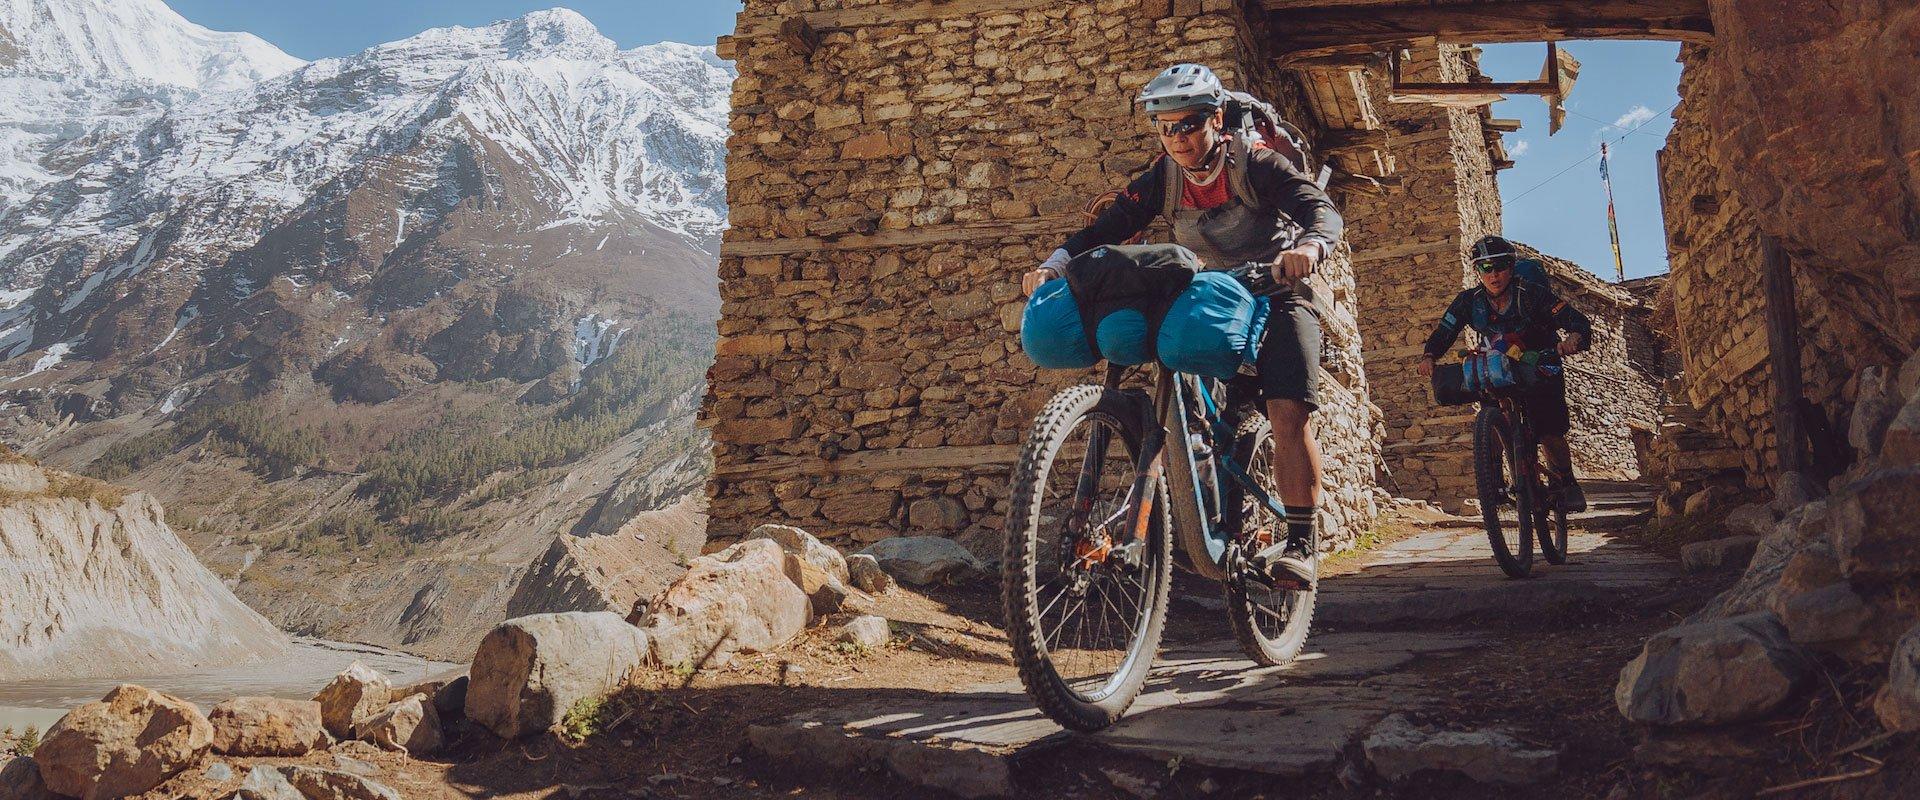 vimff 2019 mountain bike night title bg flipped